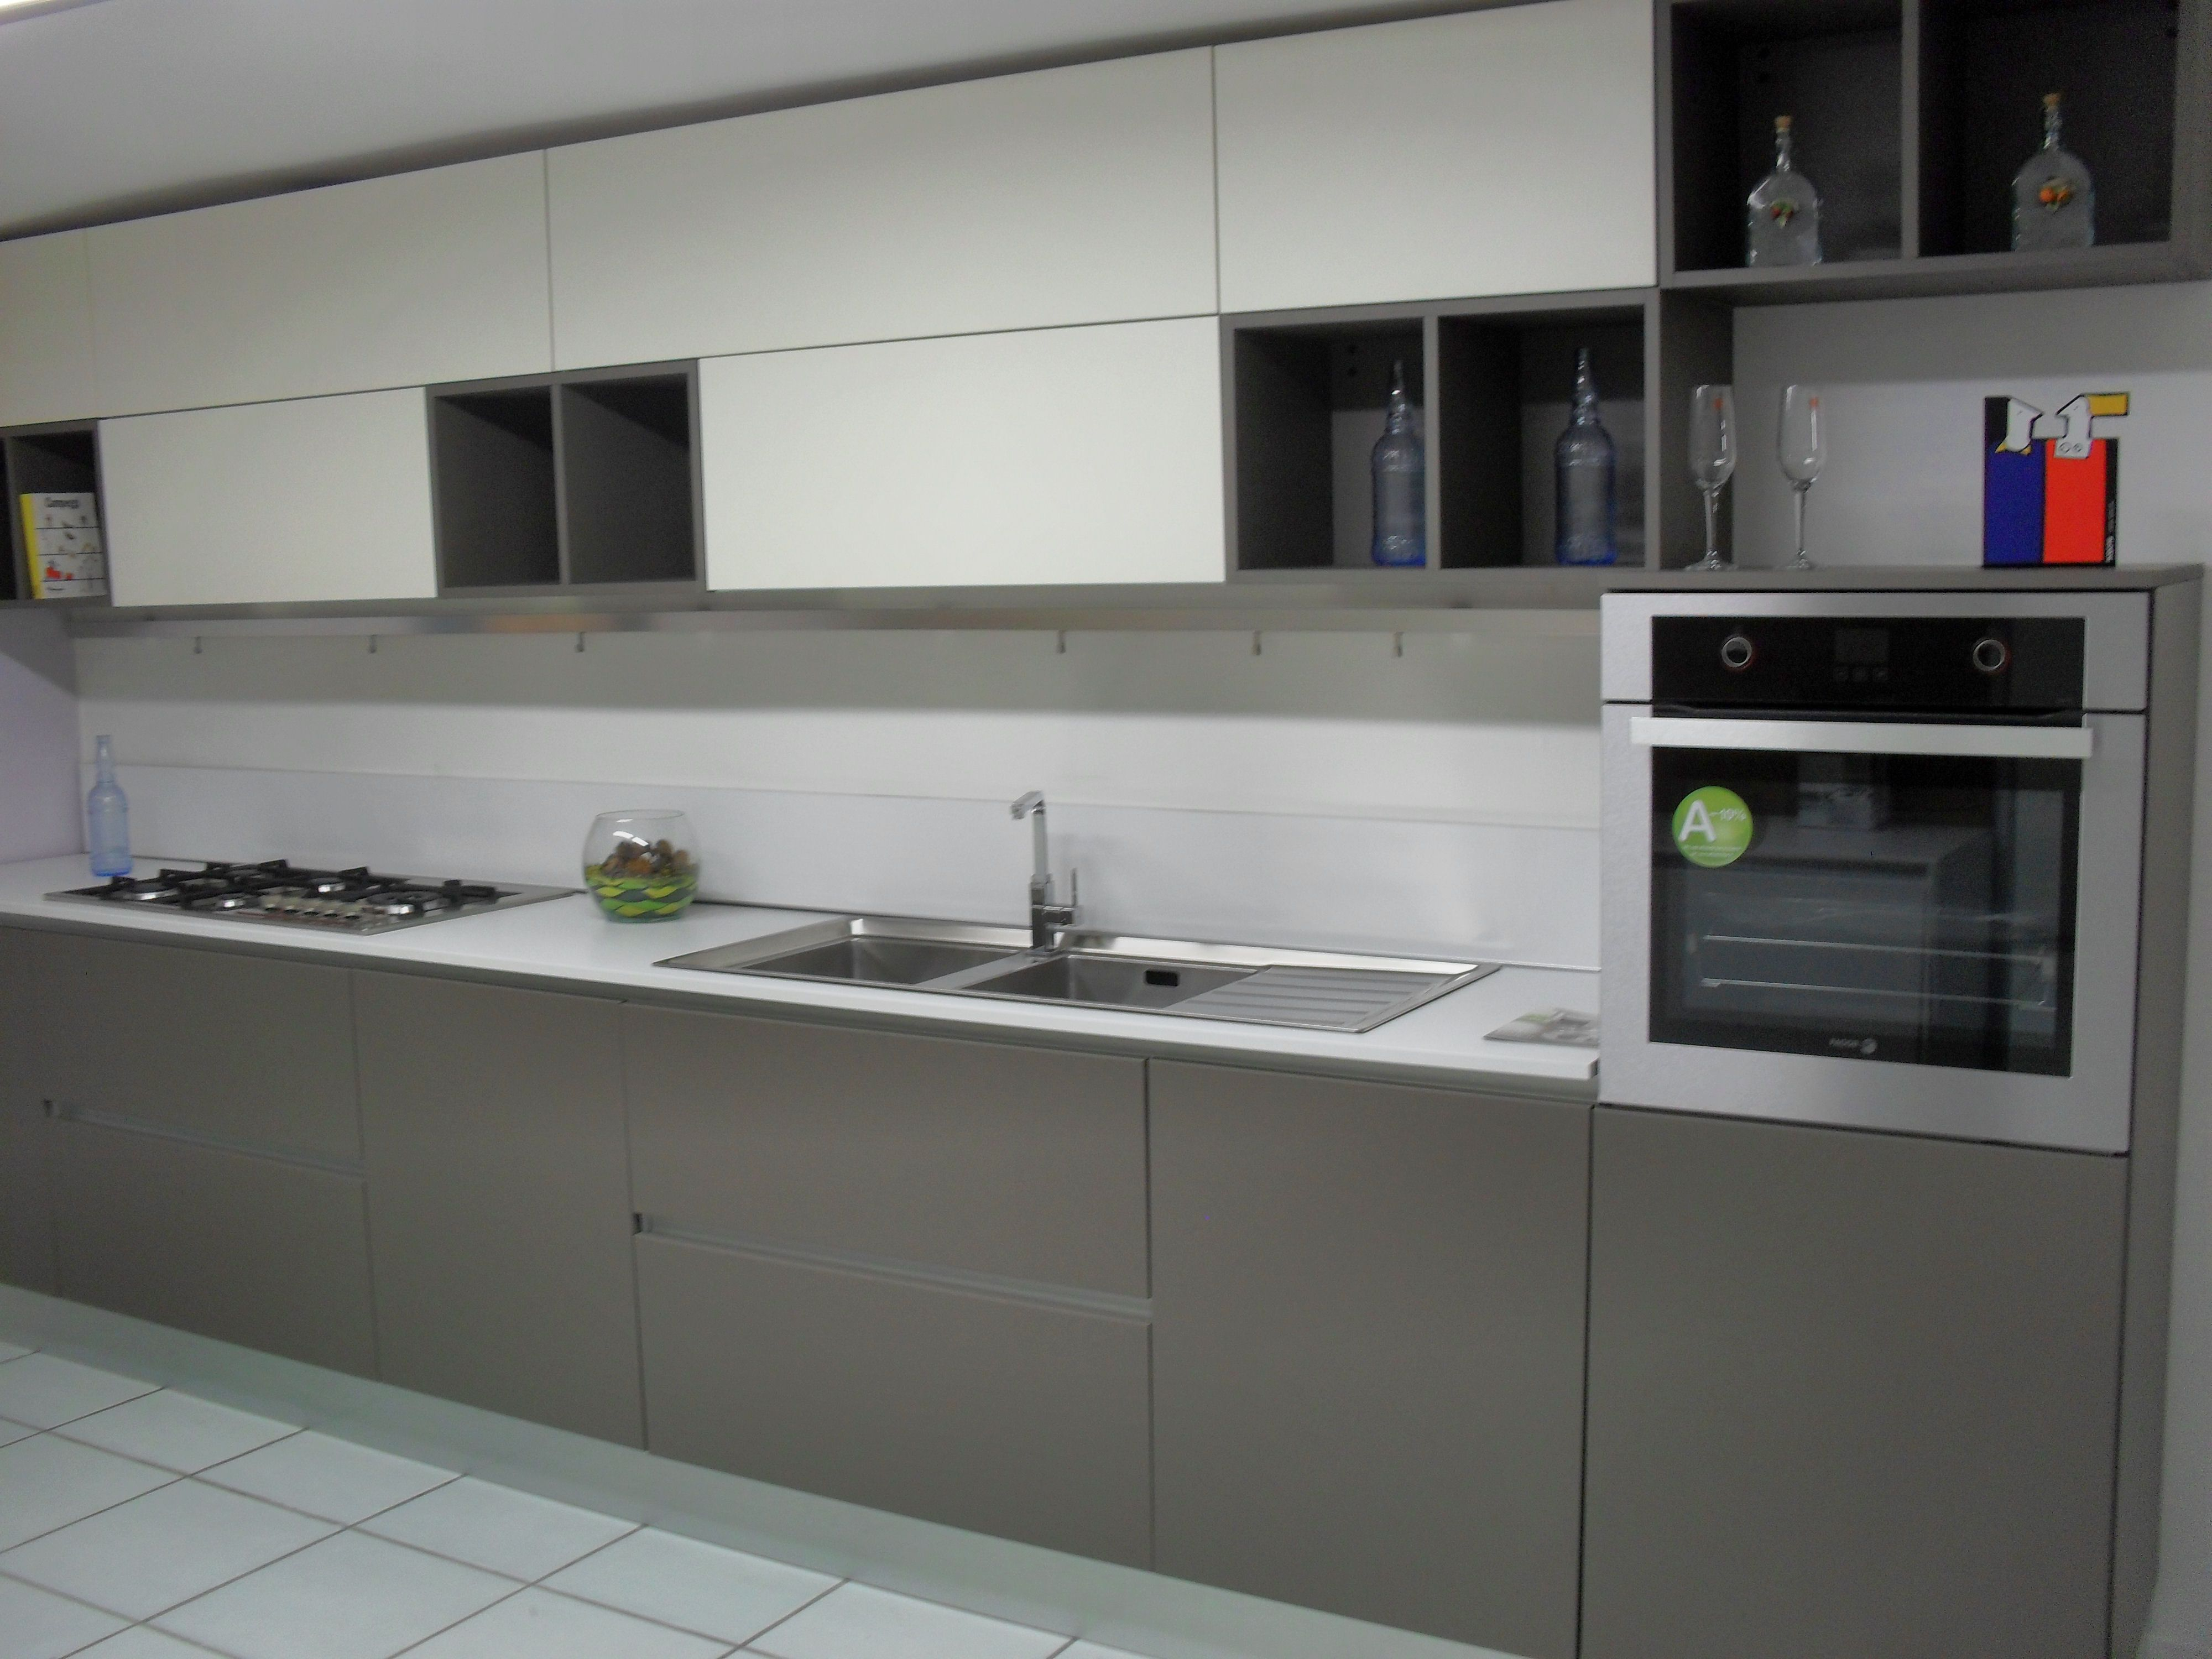 Cucina pedini modello eko kuchnie pinterest cucina for Pedini cabinets